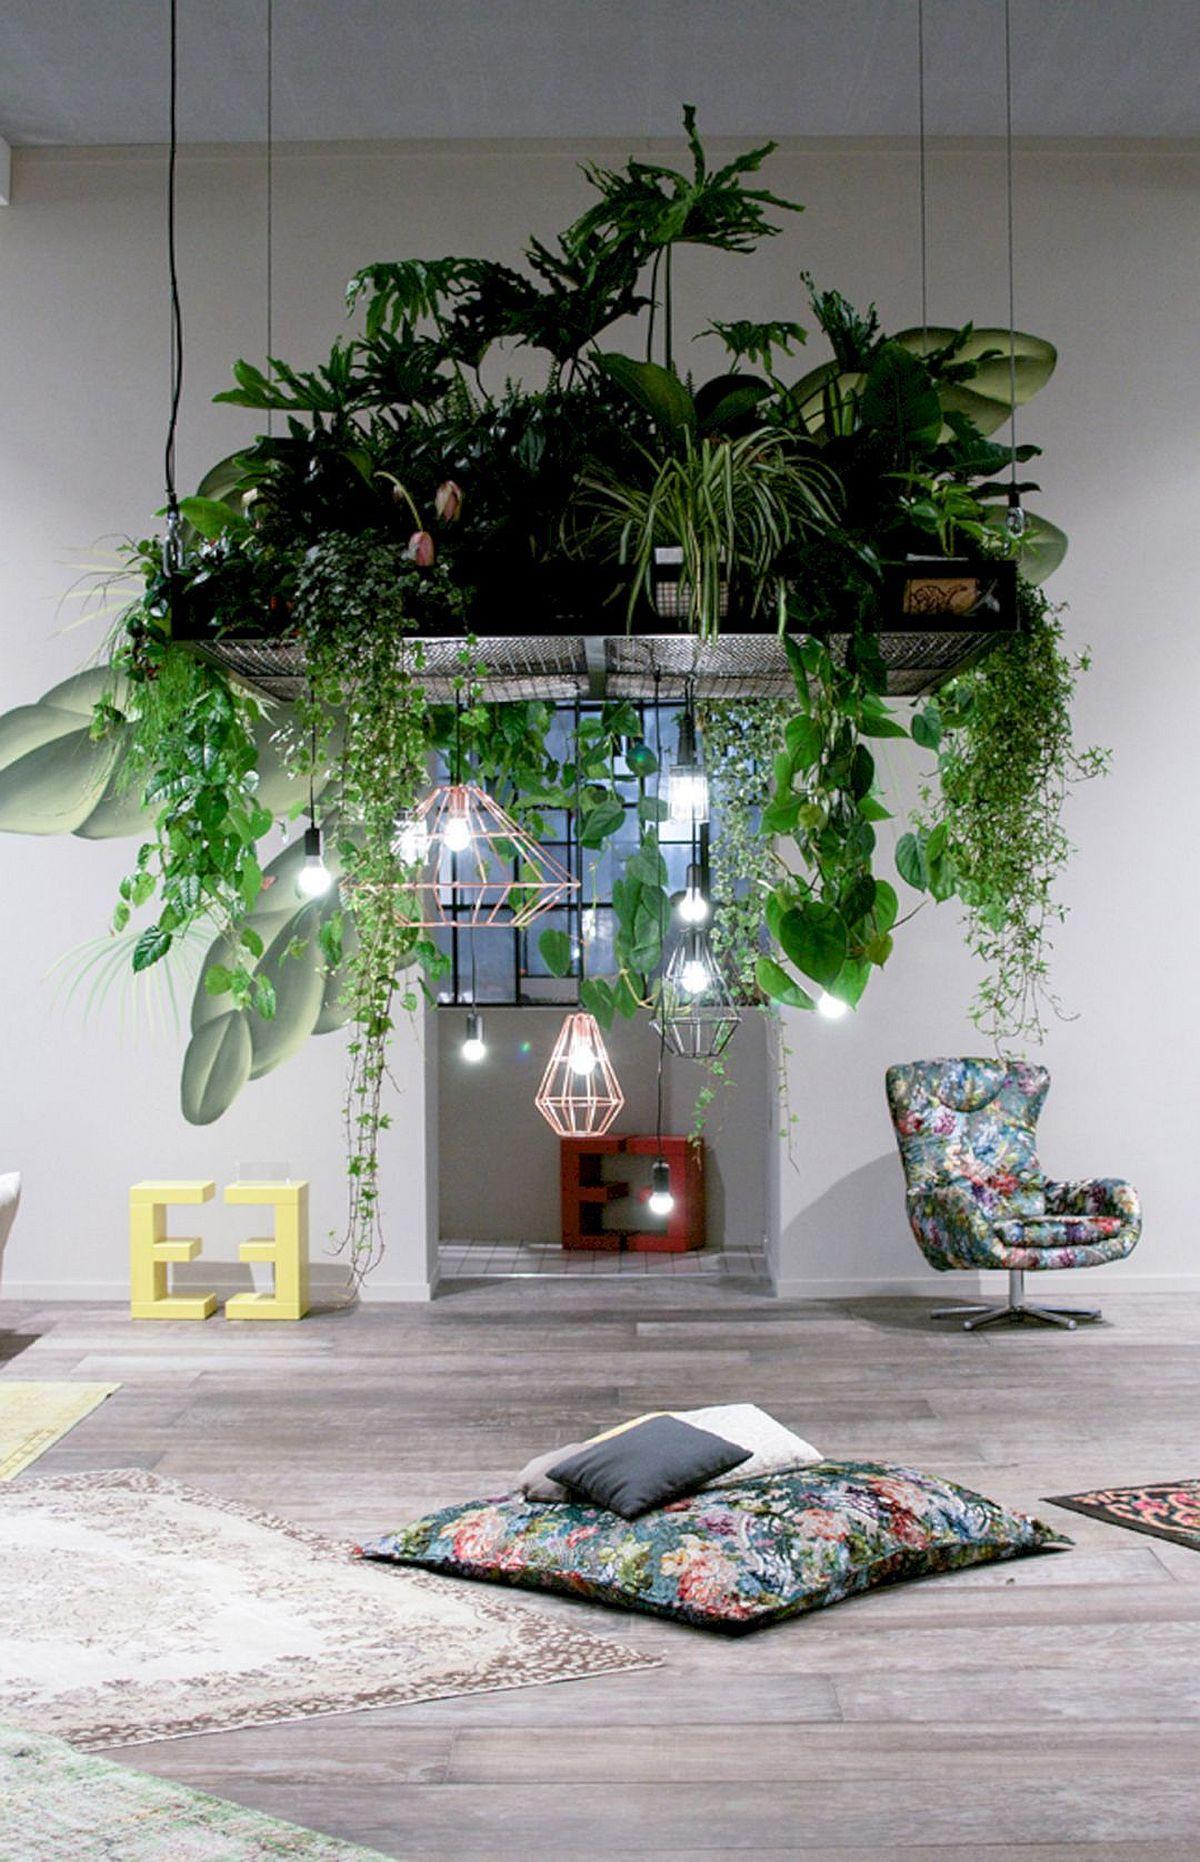 adelaparvu.com despre idei de decorare a casei cu plante (3)